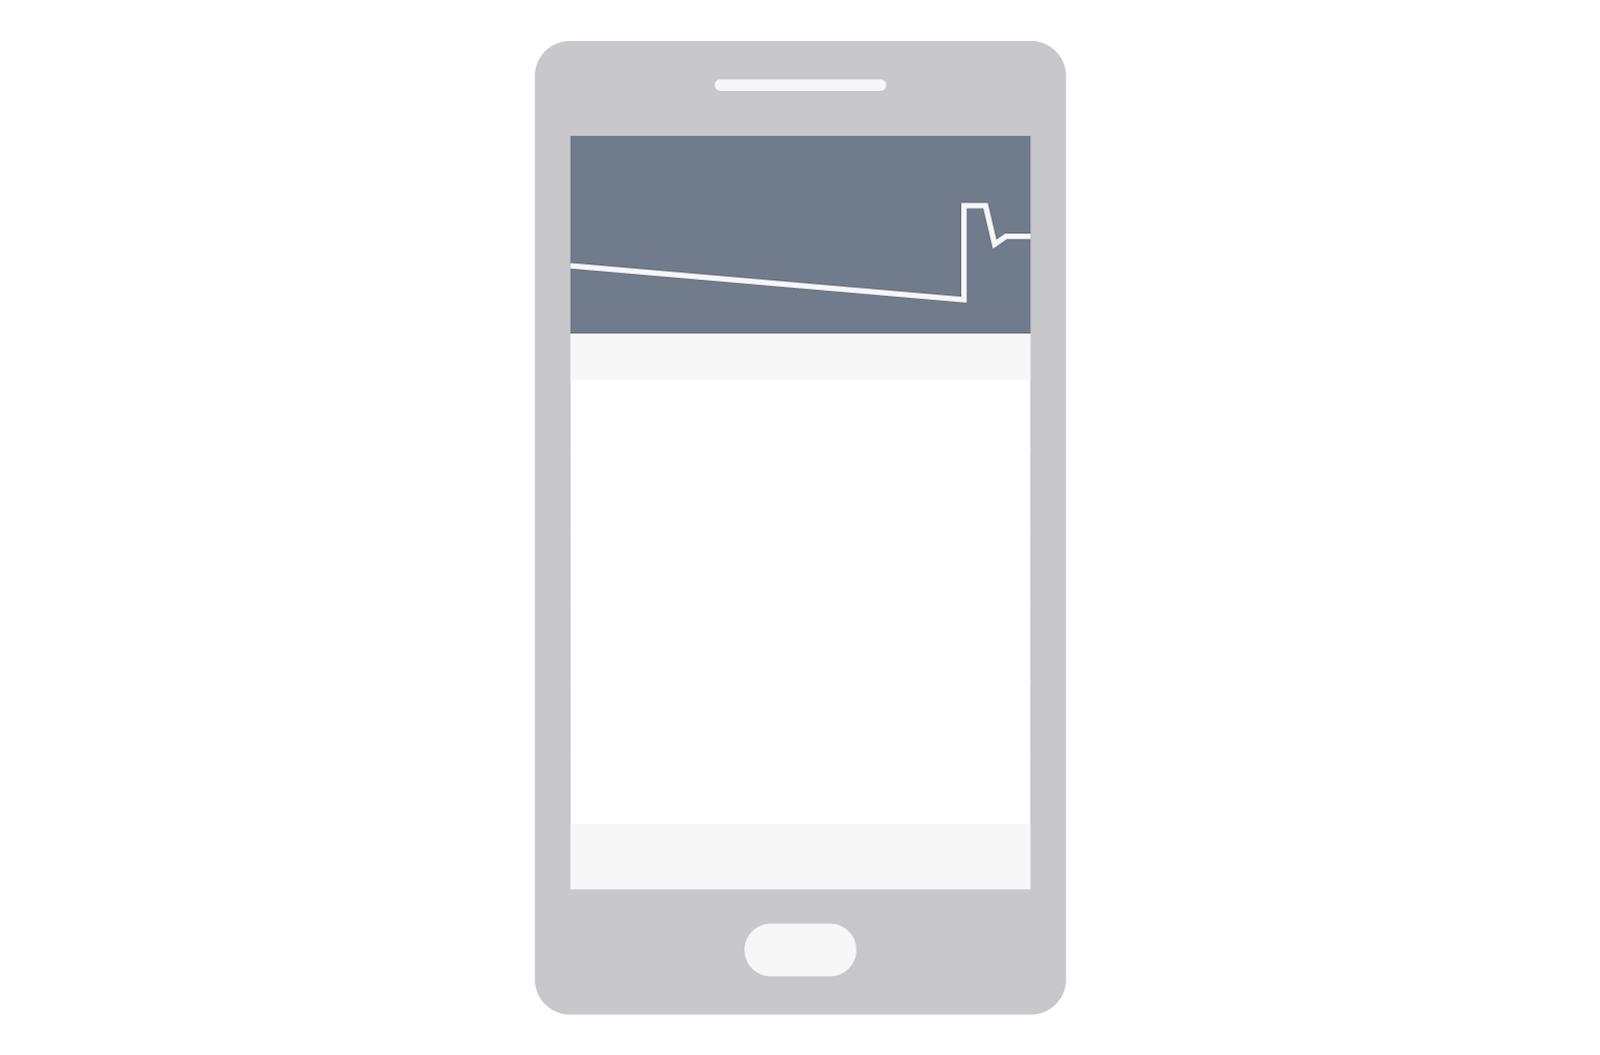 Illustration of the Monzo app